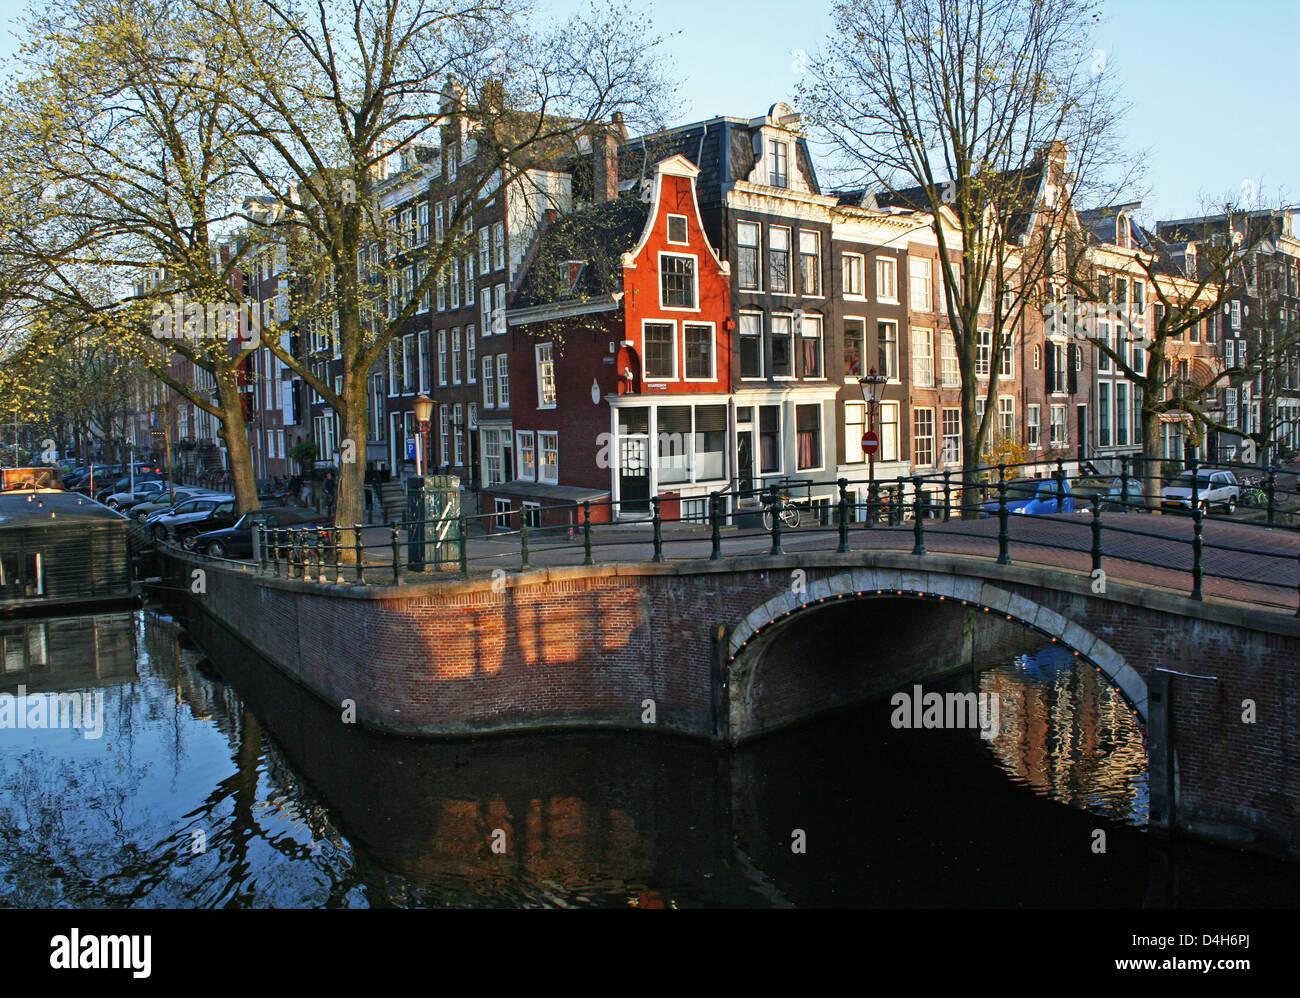 The Netherlands Holland Amsterdam Prinsengracht Reguliersgracht Clock gable ± 1675 Canal District Stork Corner - Stock Image